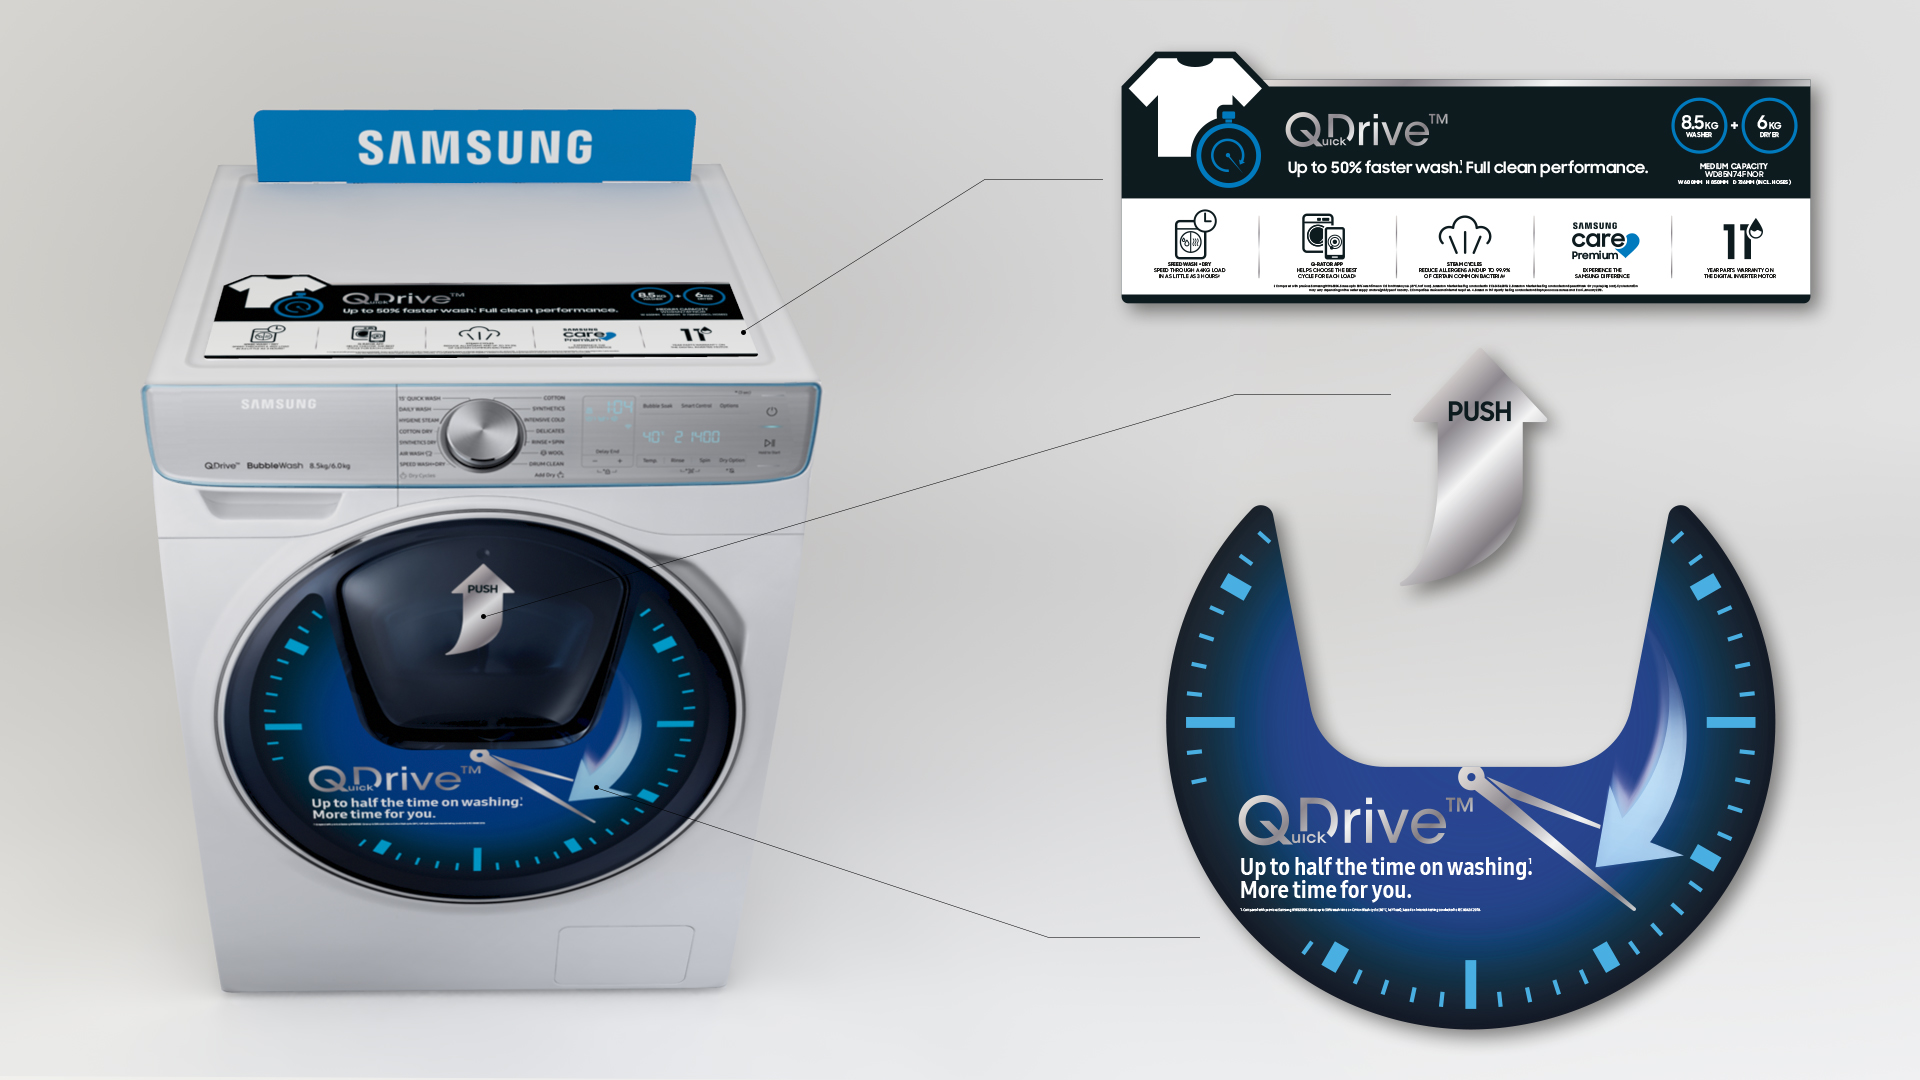 Samsung QDrive POS